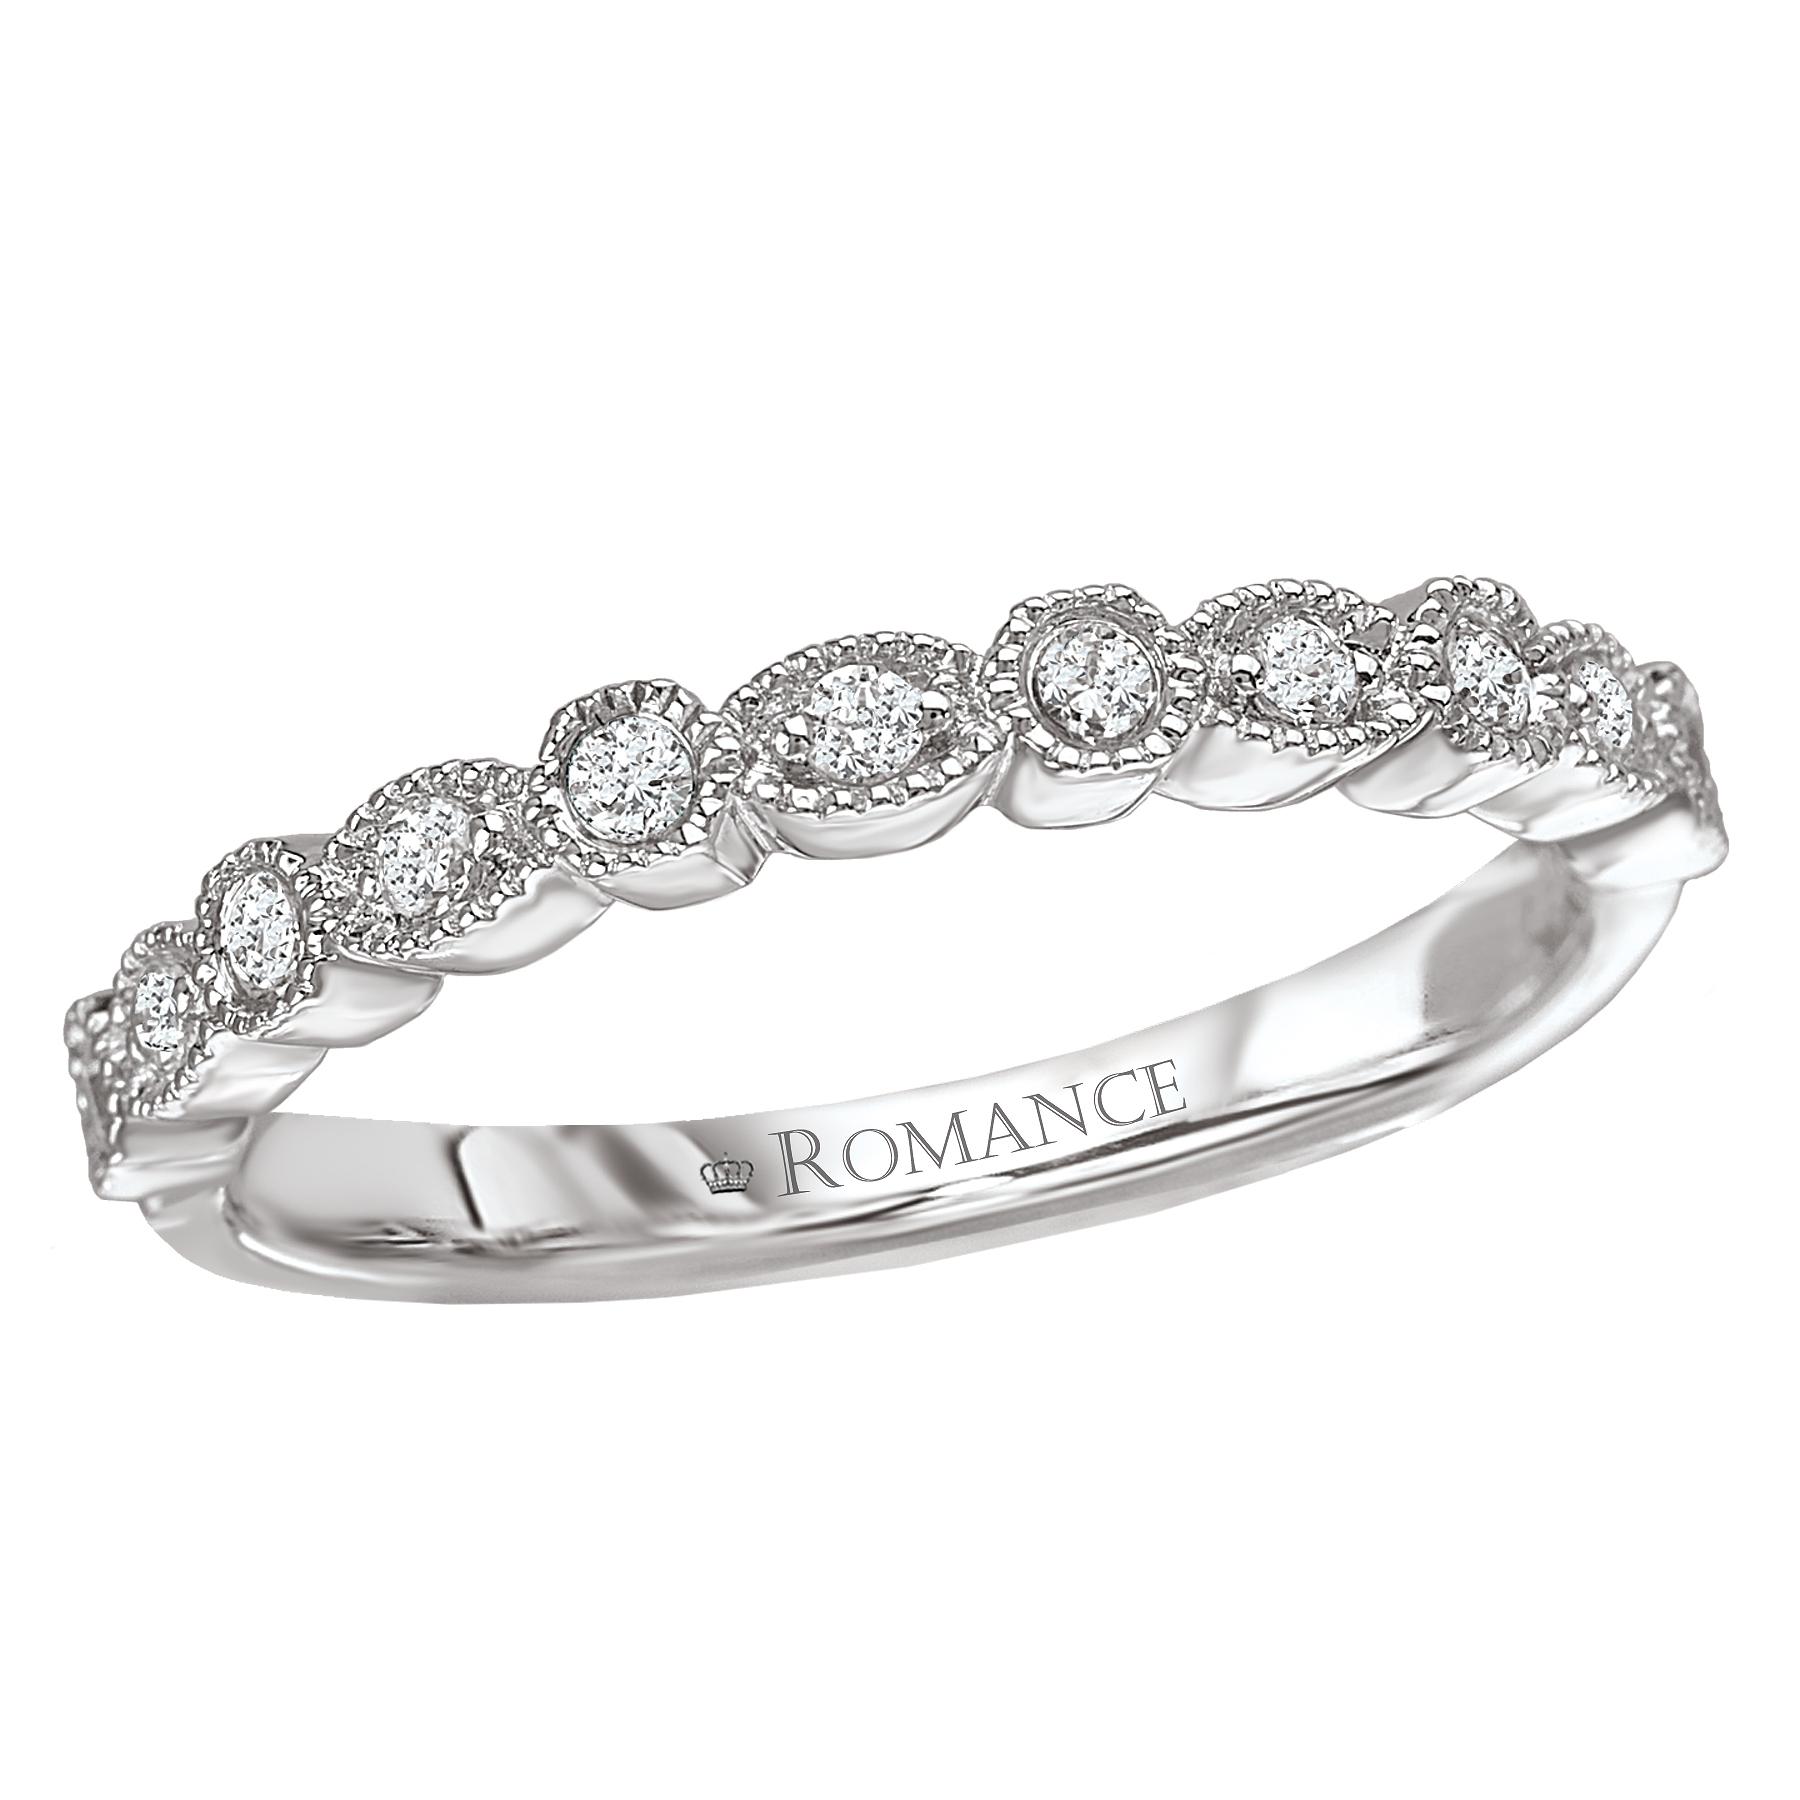 Romance Wedding Bands 117225-W product image